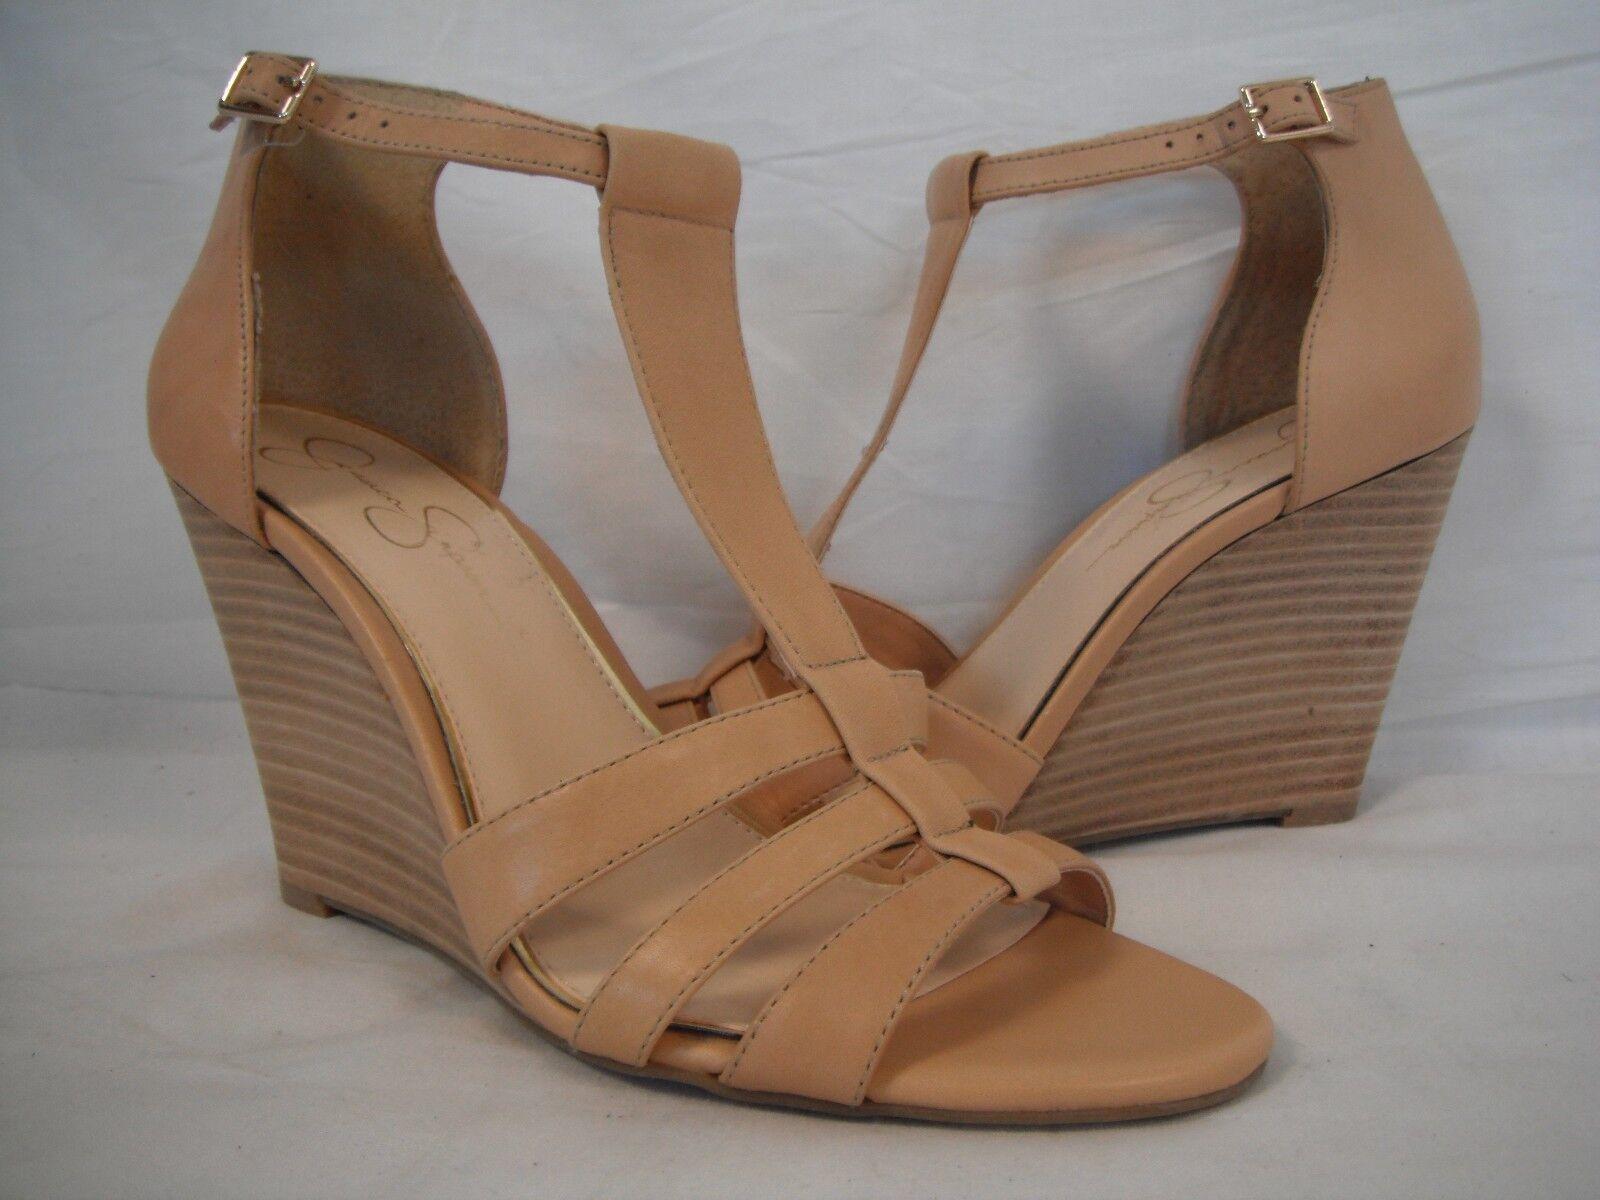 Jessica Simpson 10 M McCorde Nude Leder Open Toe Wedges NEU Damenschuhe Schuhes NWOB